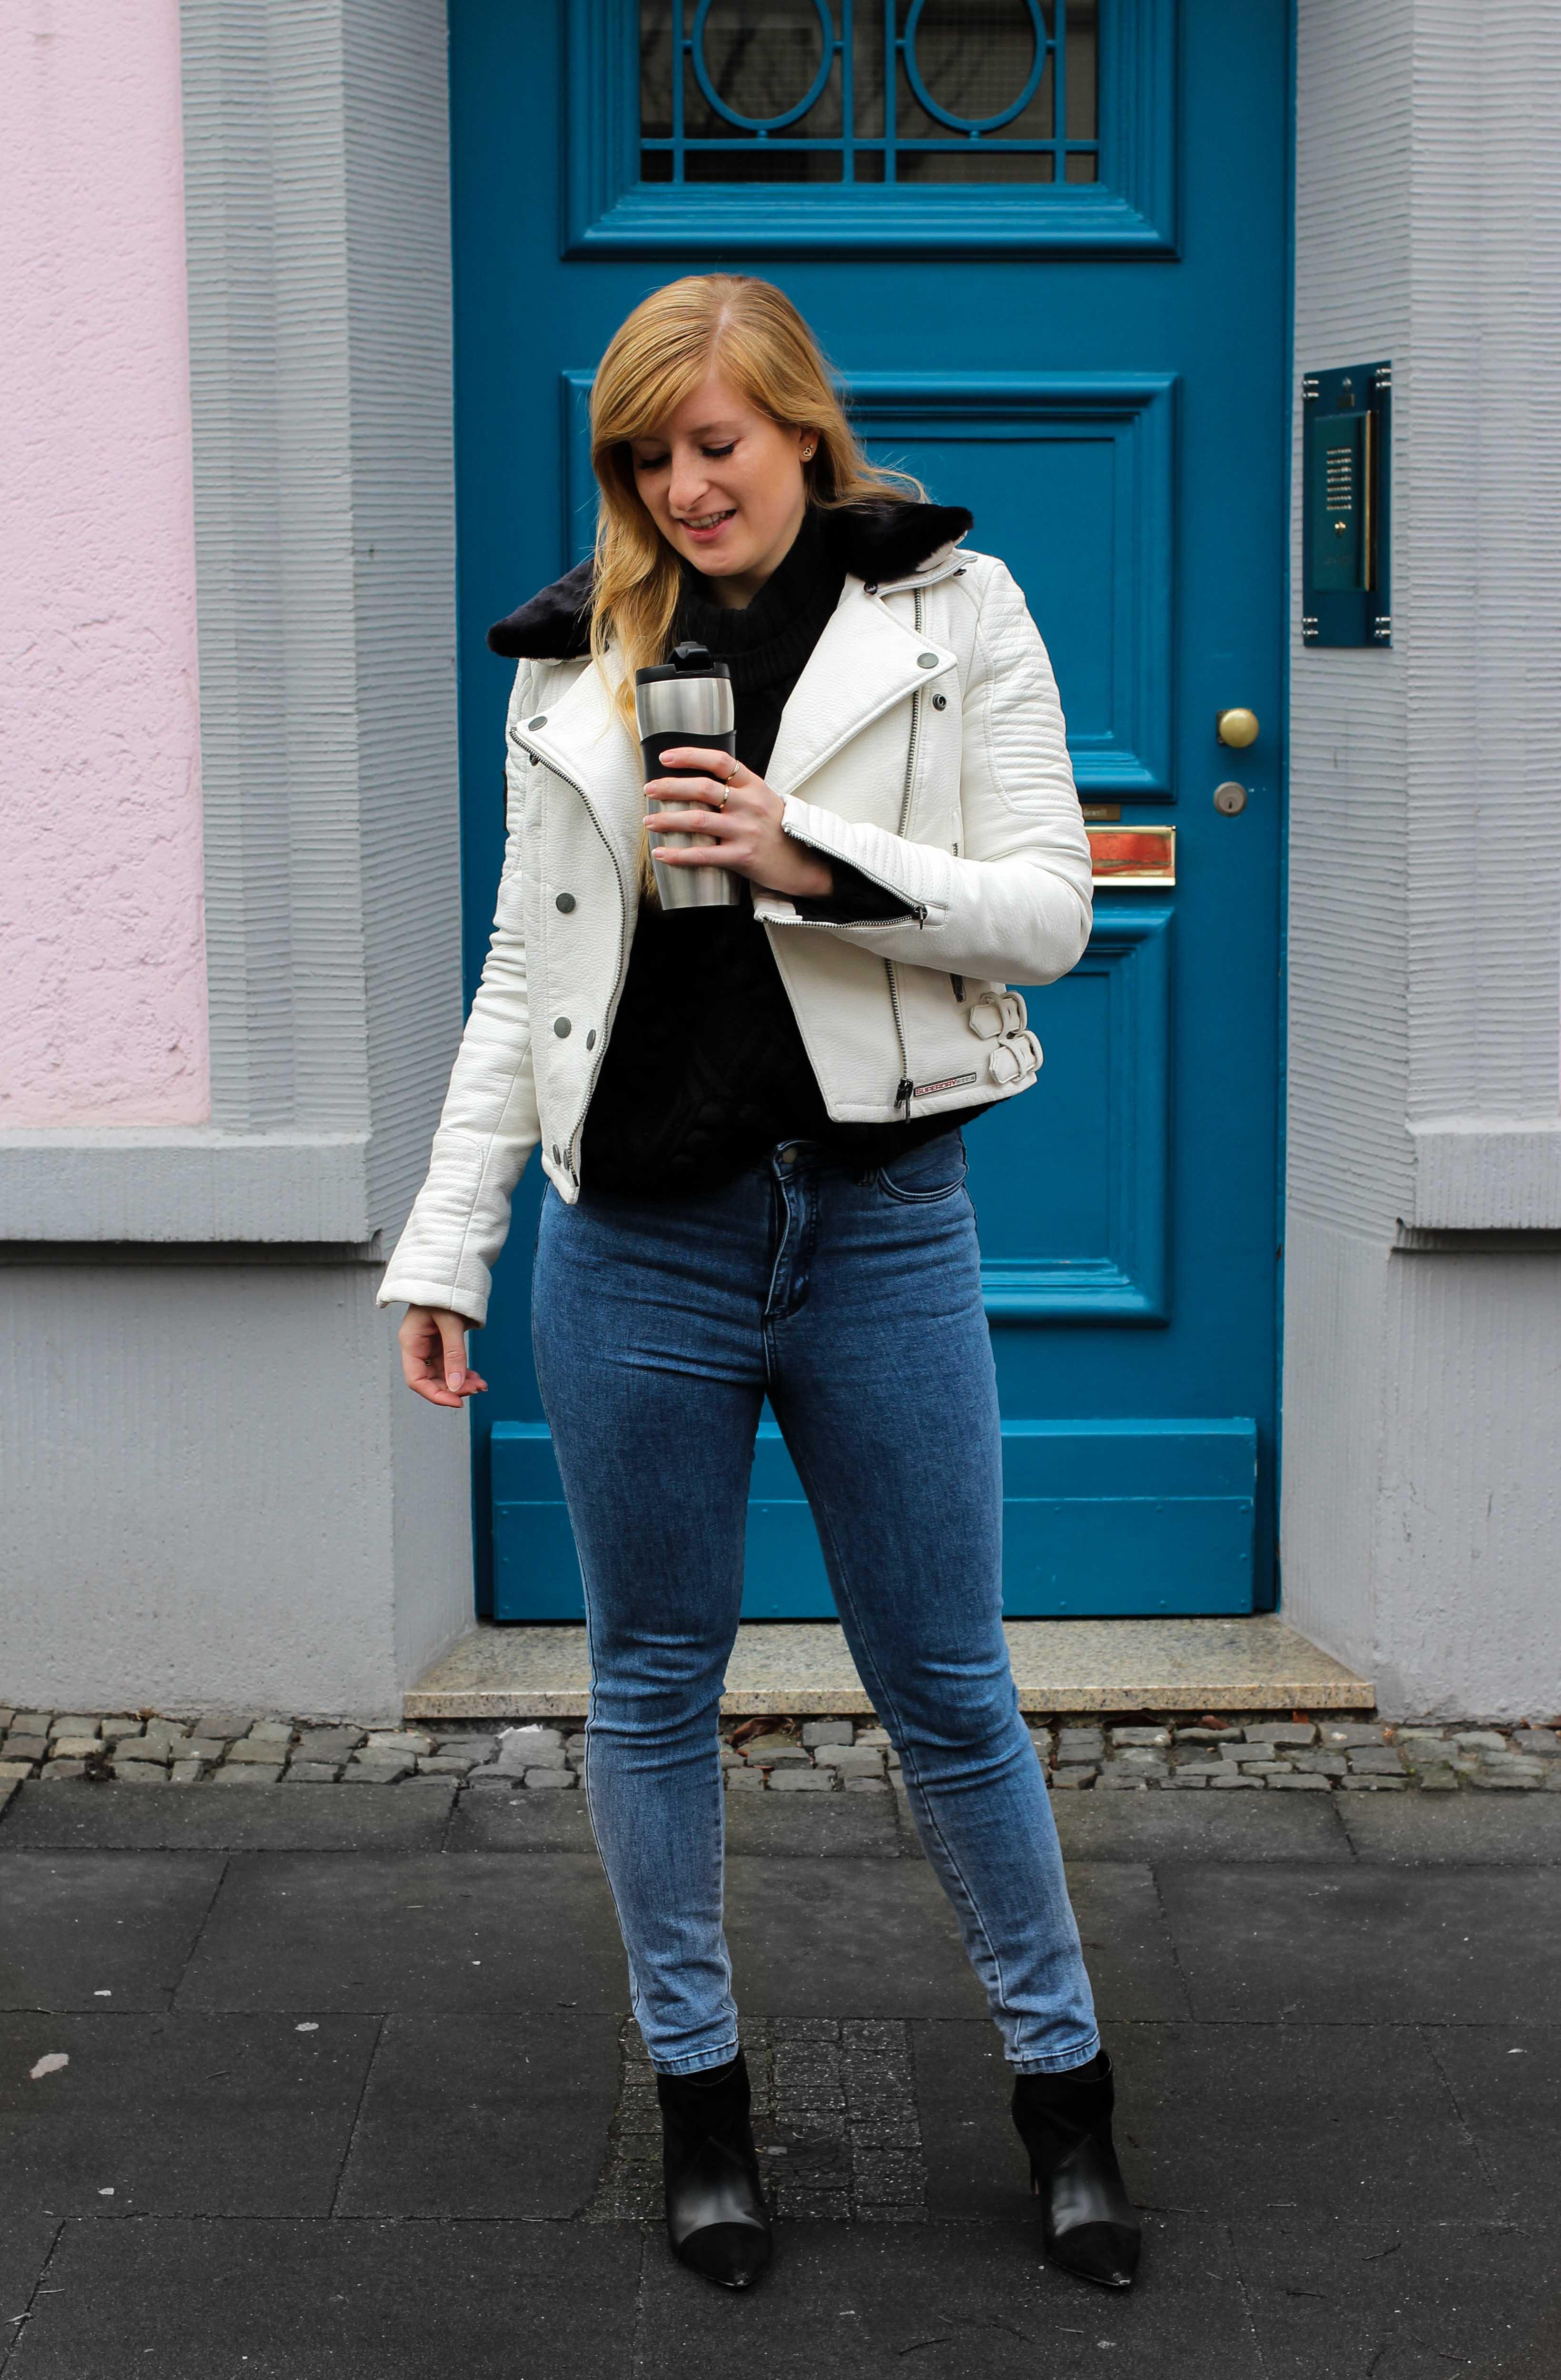 Weiße Lederjacke kombinieren Blaue Highwaist Jeans blaue Tür Casual Streetstyle Modeblog Bonn 1